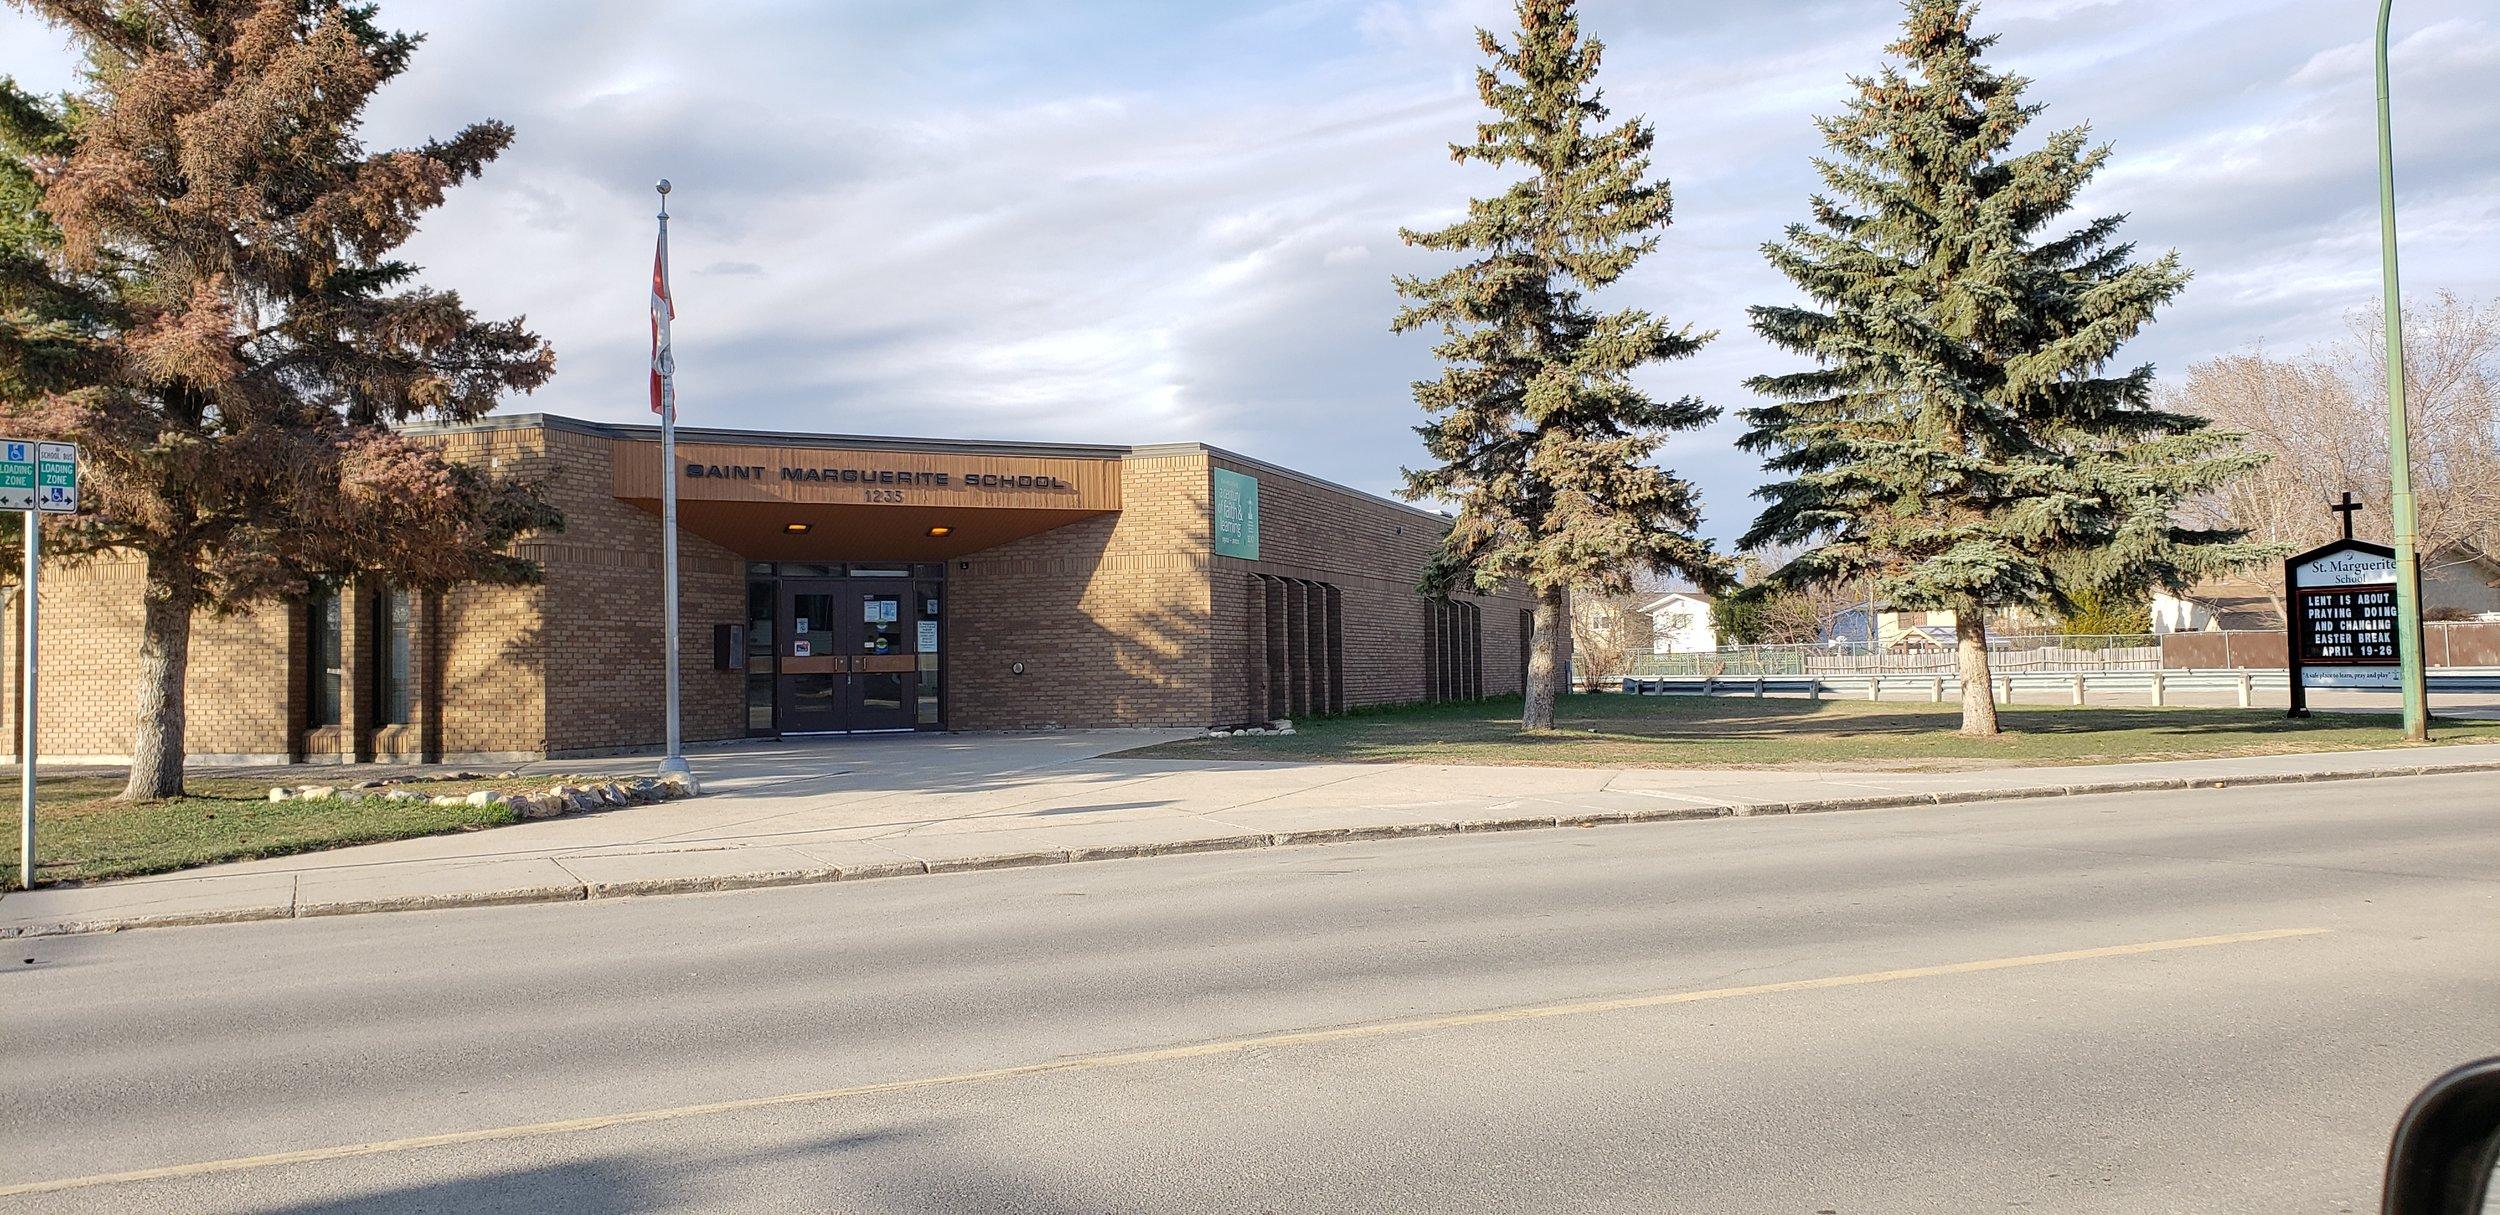 St. Marguerite -                1235 McCormack Rd, Saskatoon, SK S7M 5L6                  St.Marguerite@gscs.ca - (306) 659 - 7380